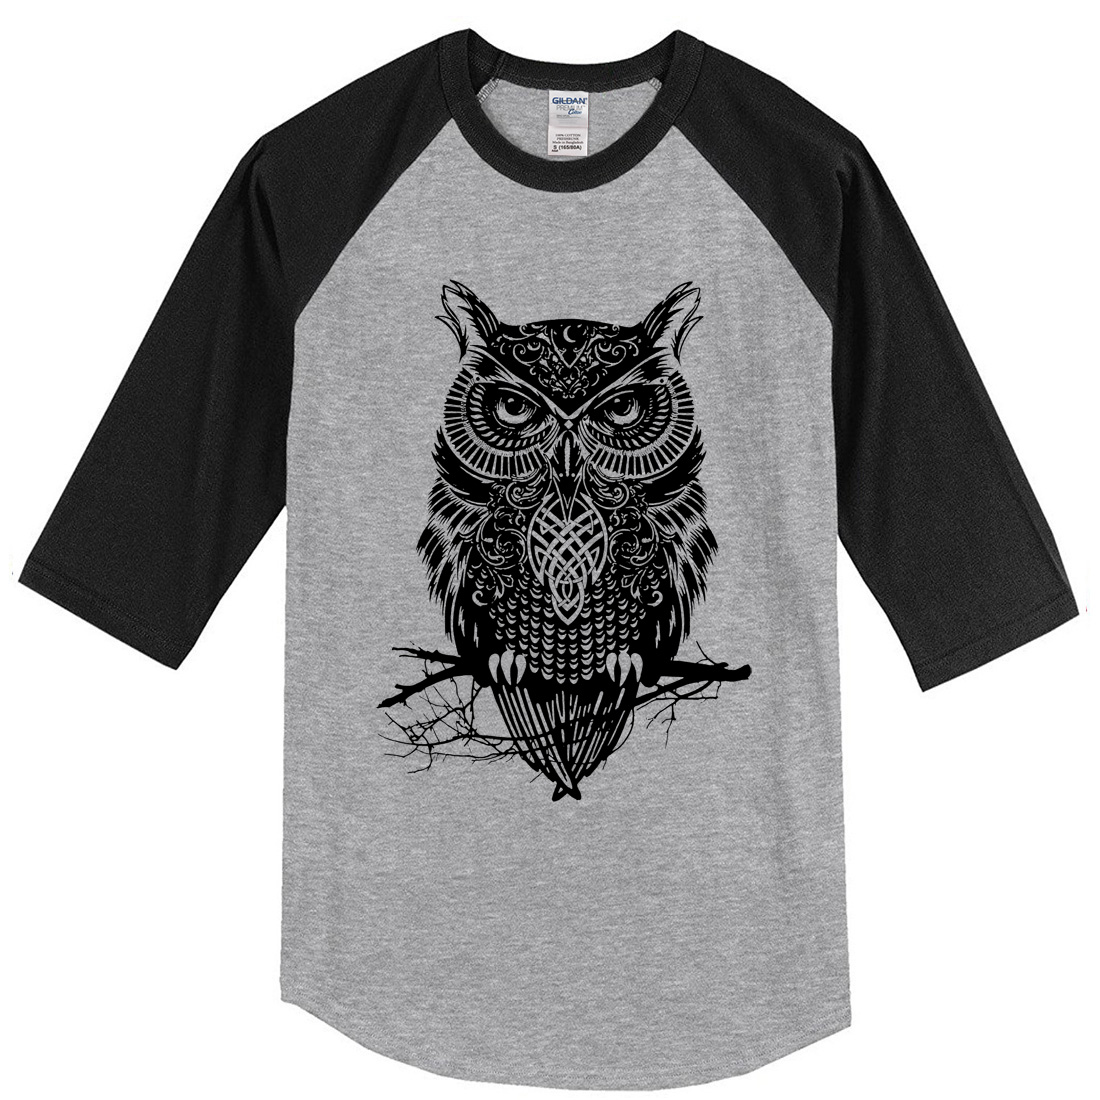 2019 Summer Men's T-shirts Three Quarter Sleeve Owl Casual Men's Sportswear Raglan T-shirt Brand Clothing Tops Casual T Shirt